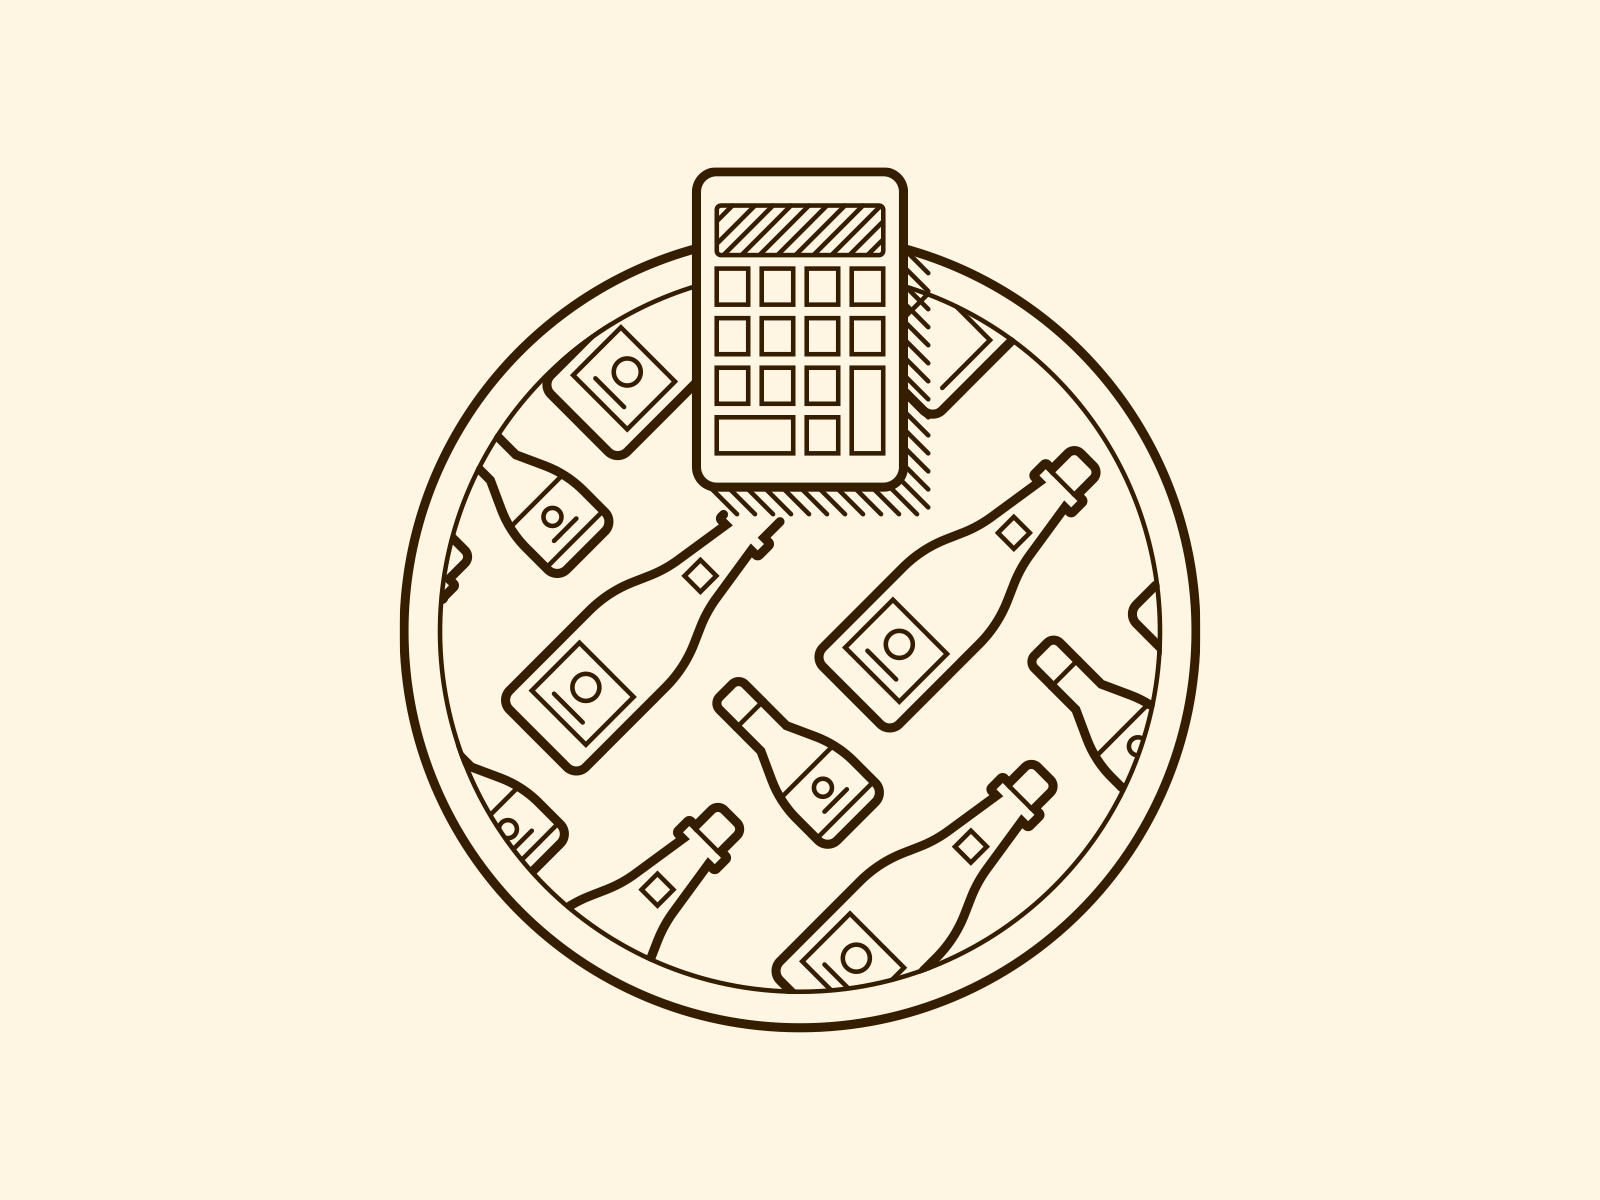 Fxt illustration cava calculator copy